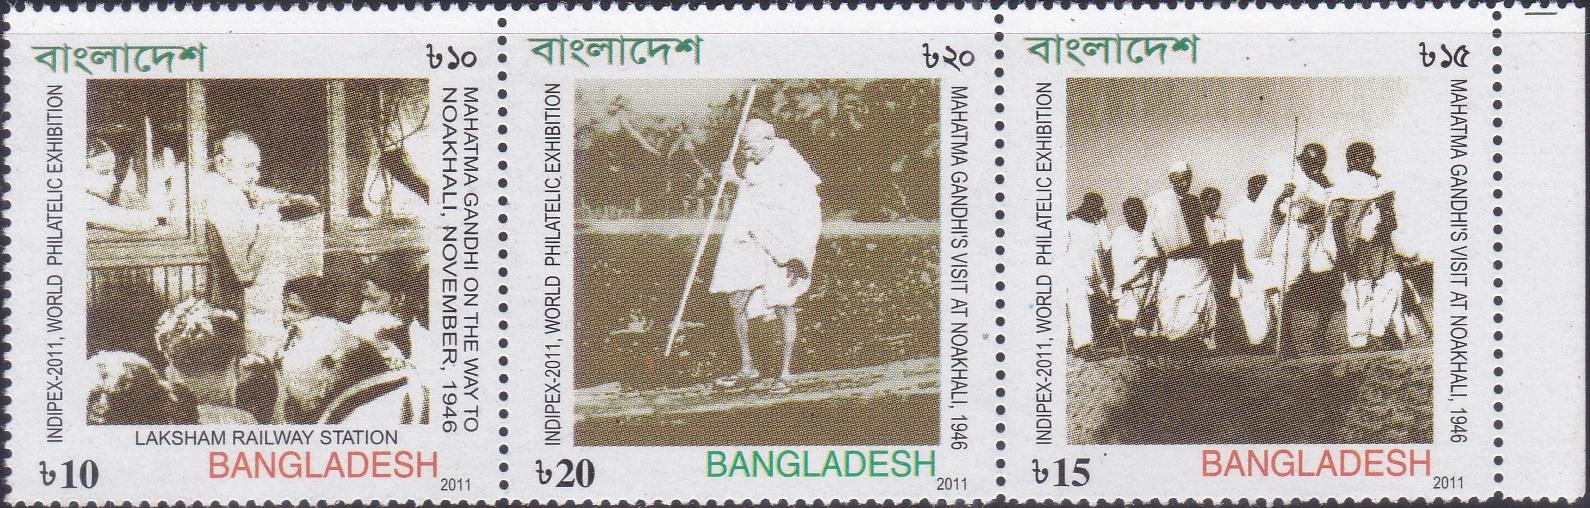 mahatma-gandhis-visit-at-noakhali-1946-bangladesh-setenant-stamps-2013